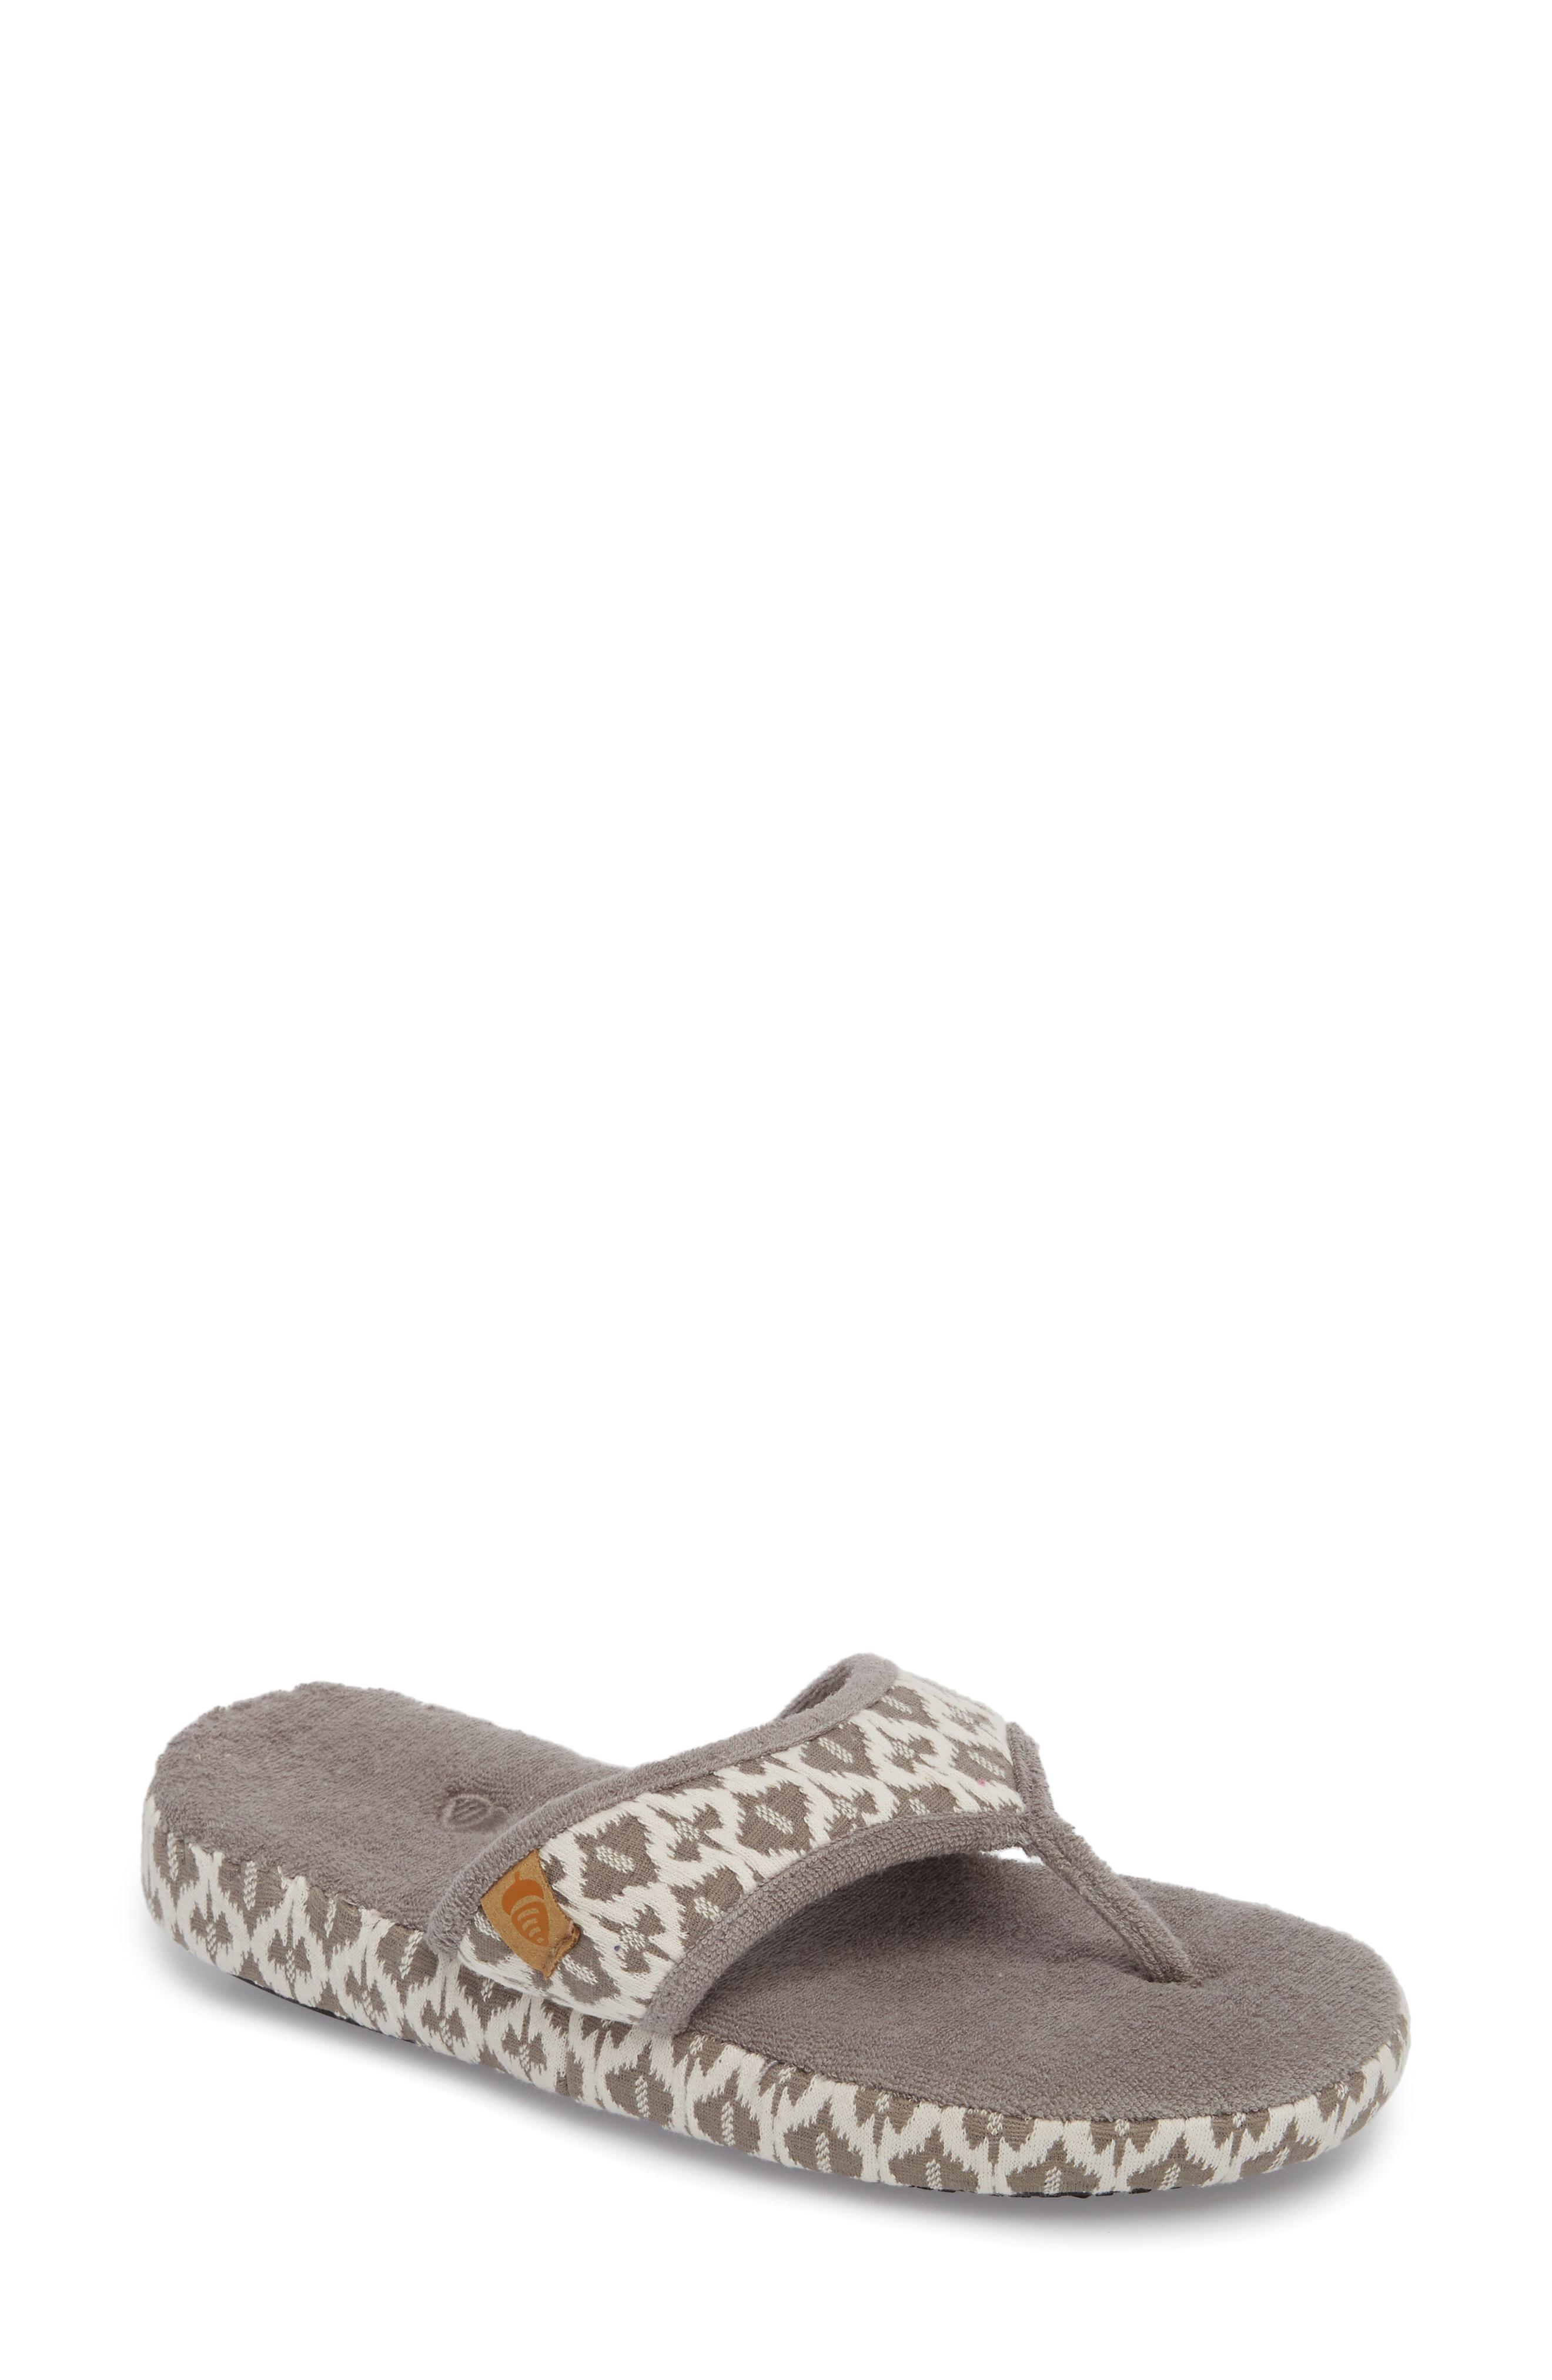 b8550dc05ca Acorn Summerweight Slipper In Pebble Diamond Fabric